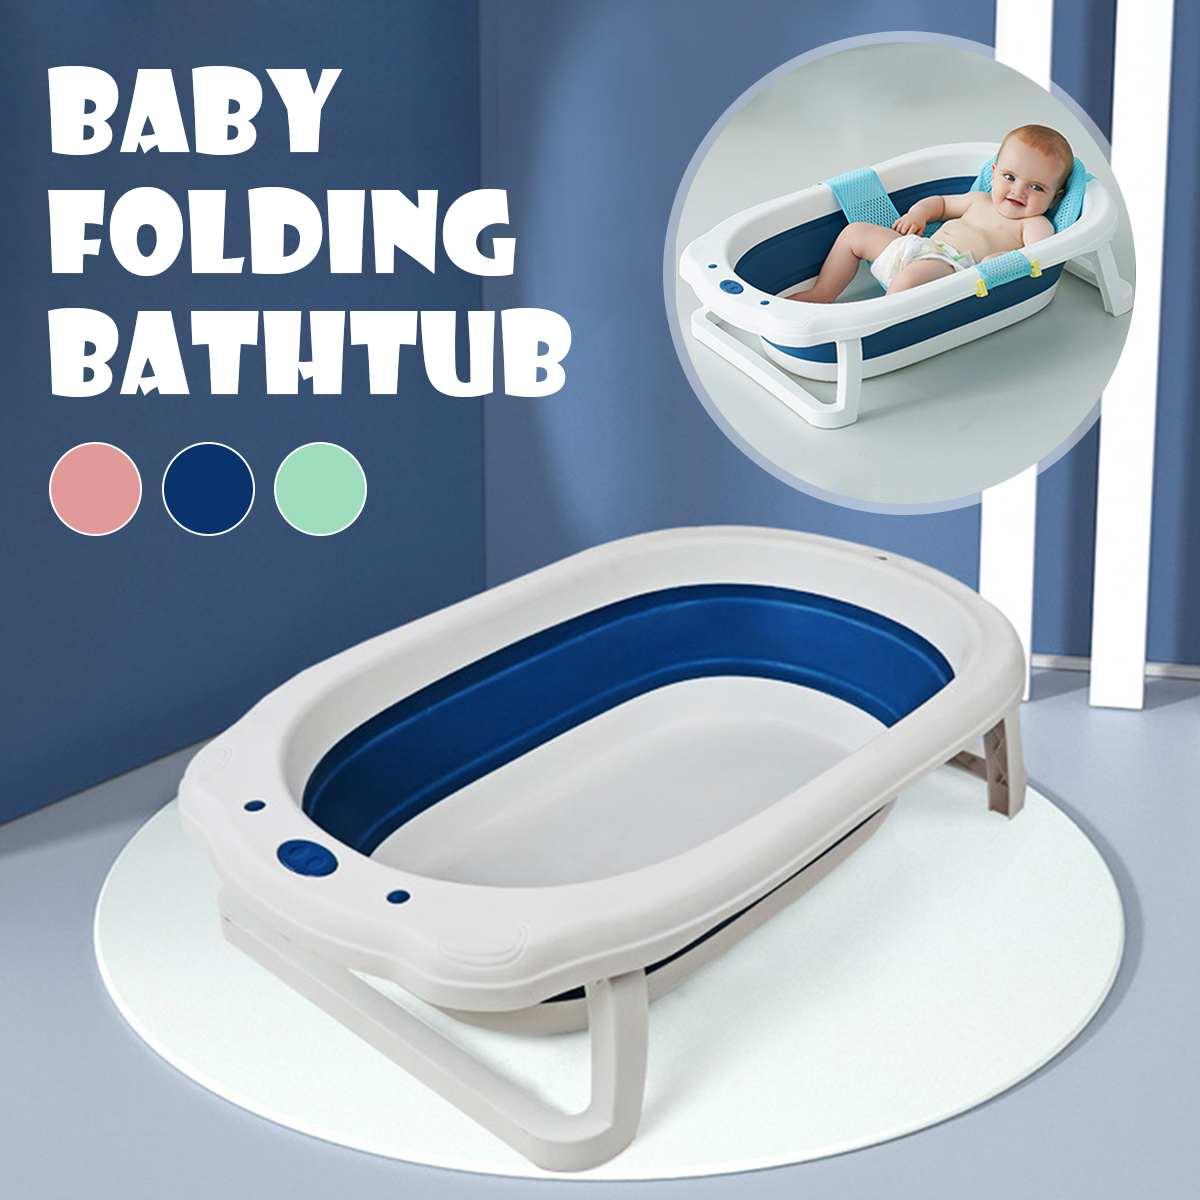 Foldable Baby Shower Tub Infant Newborn Bath Tubs Baby Non-Slip Widen Thicken Kid Bathtubs Portable Bathtub New Arrival 2020